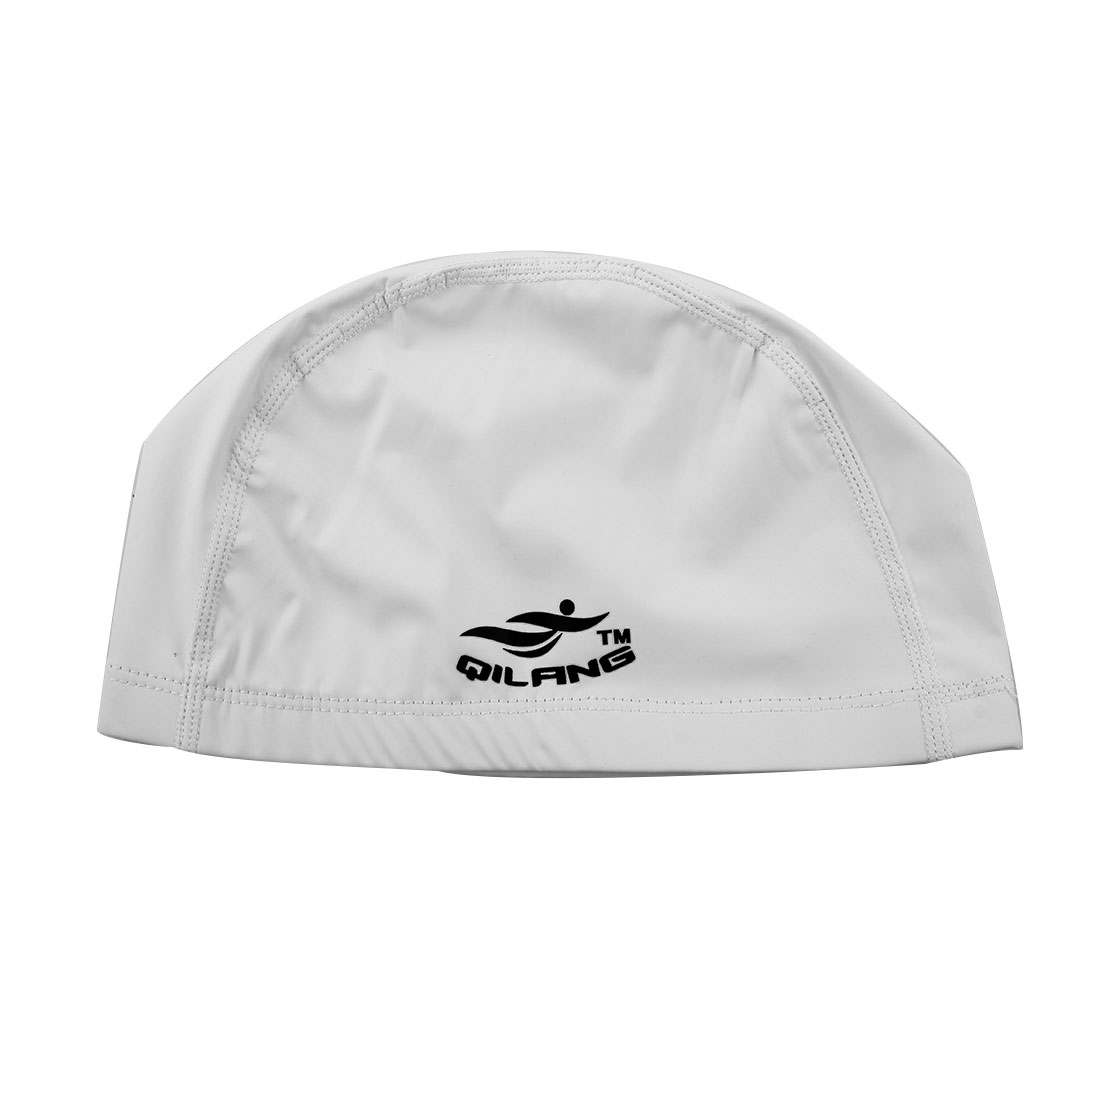 Unisex PU Dome Shaped Non-slip Stretchable Swimming Cap Portable Bathing Hat White